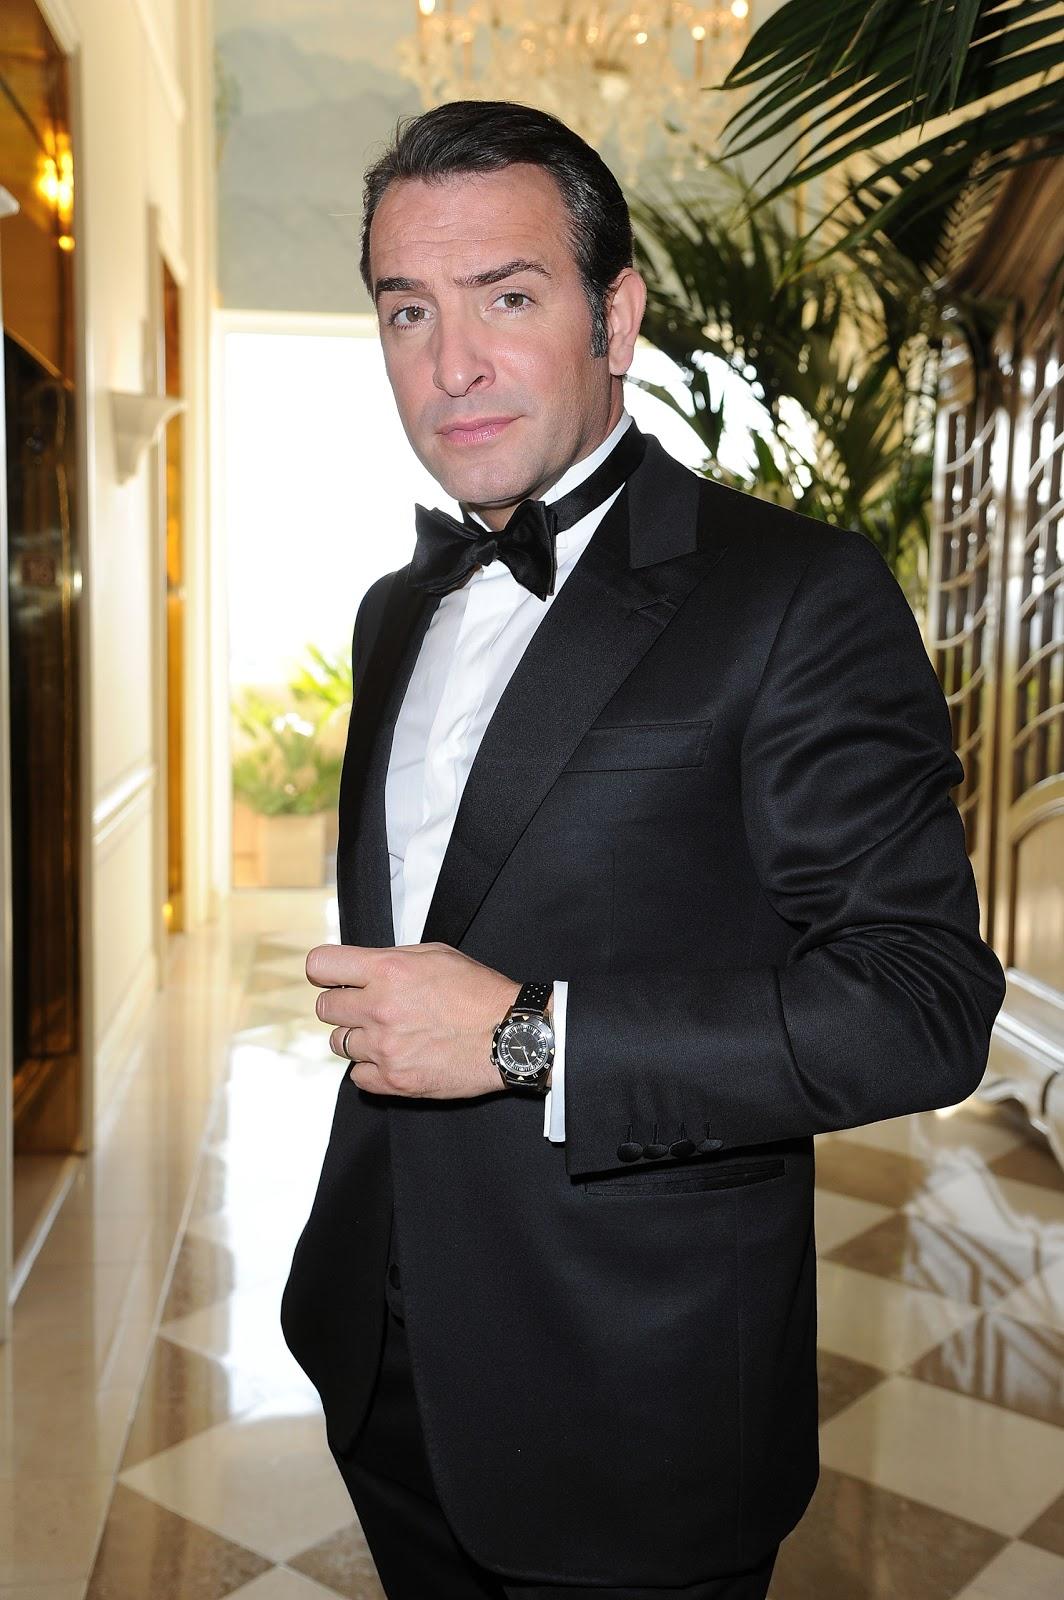 http://2.bp.blogspot.com/-DMUo3E2rr20/T0uepYaM3RI/AAAAAAAAhH0/XKDhaa9S56w/s1600/Jean_Dujardin_wearing_Jaeger-LeCoultre_Memovox_Tribute_To_Deep_Sea_at_Oscars_2012_%252540Pascal_Le_SegretainWireImage.jpg